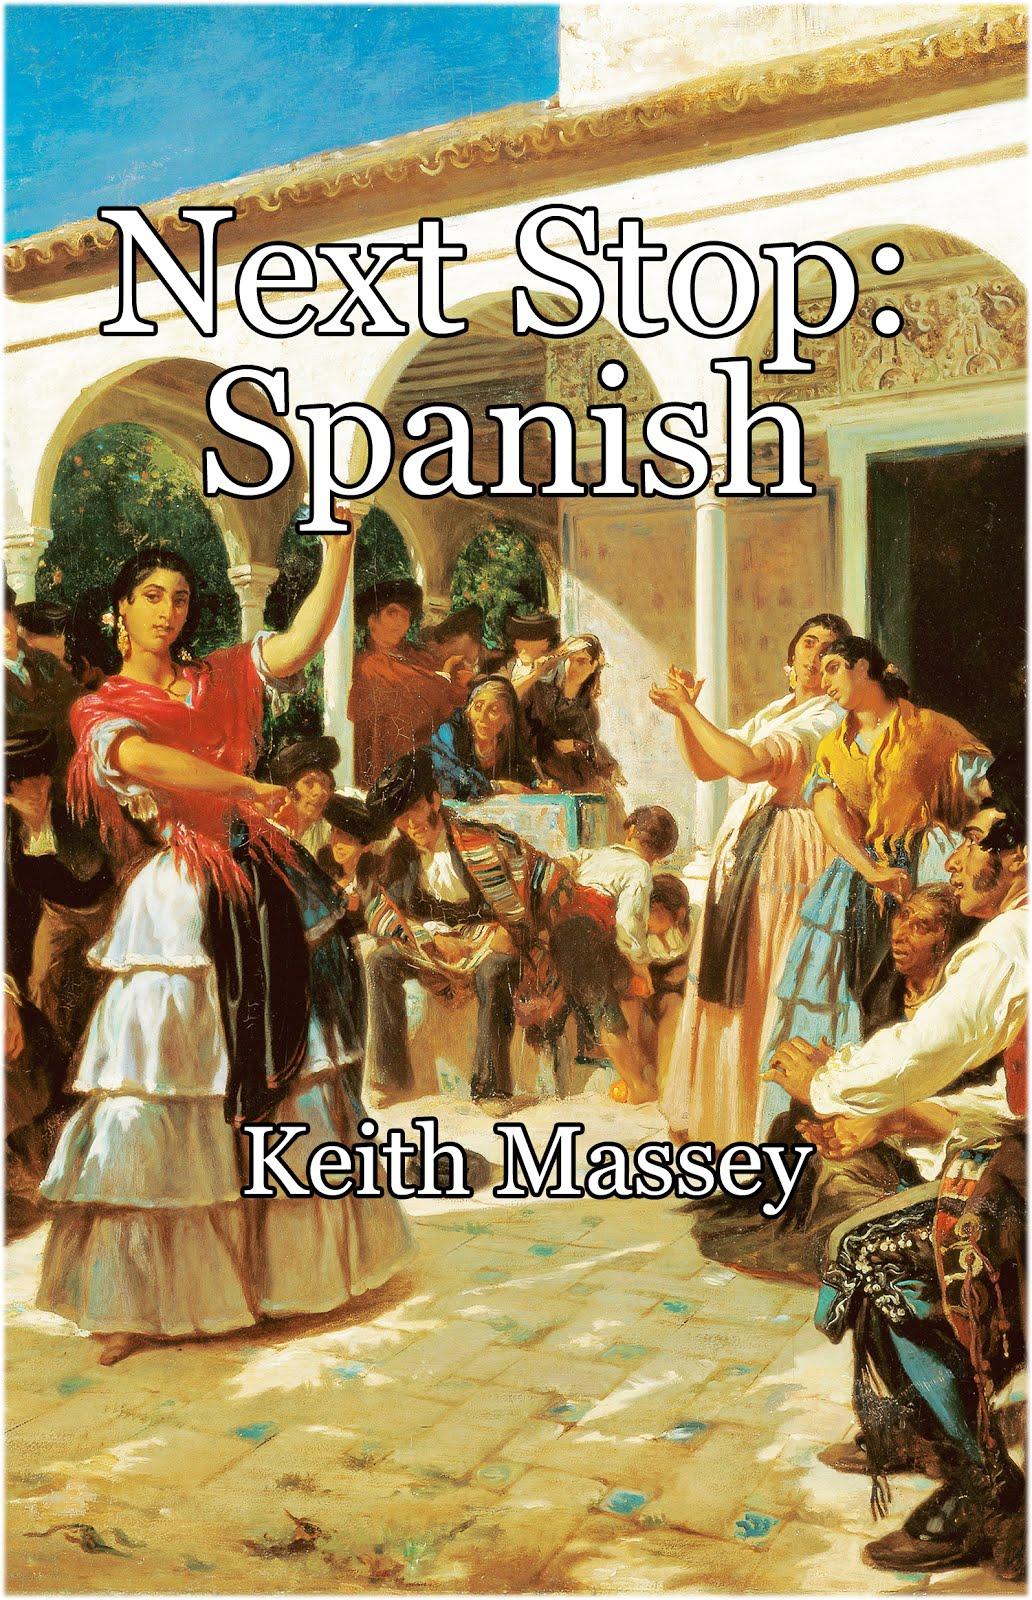 Next Stop: Spanish